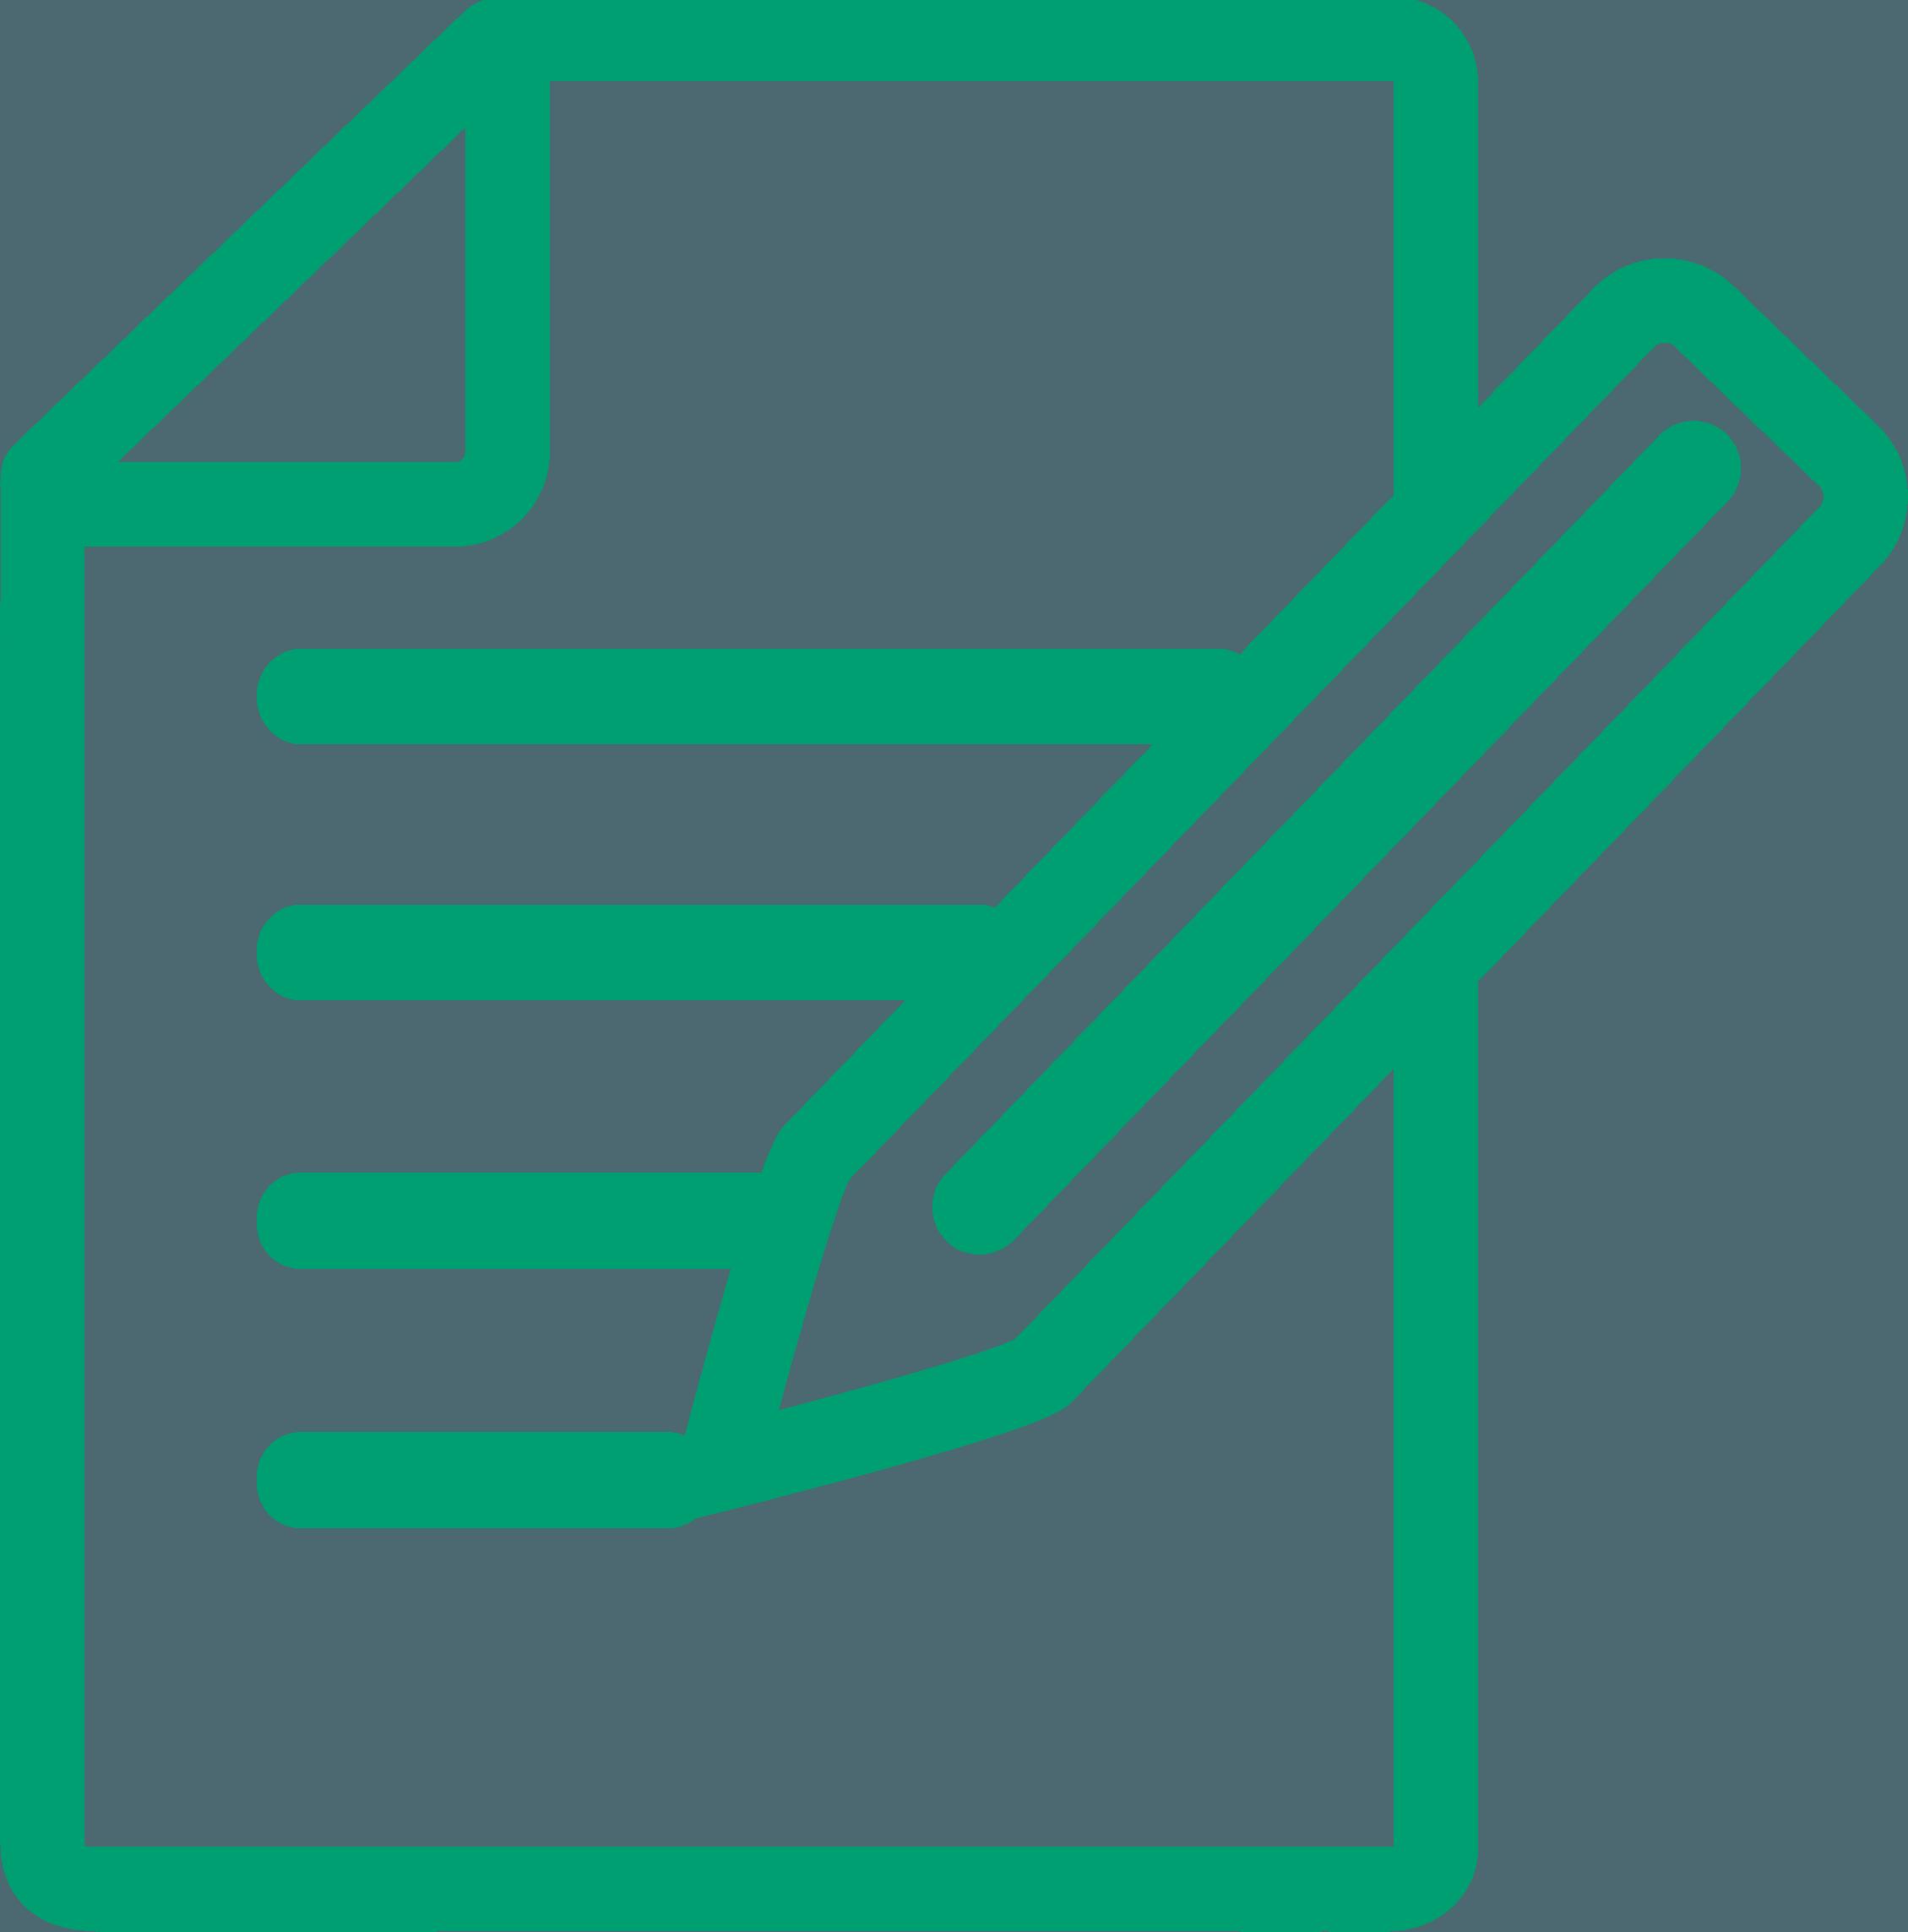 Configuring mpls vrf cisco lefml-lorraine eu